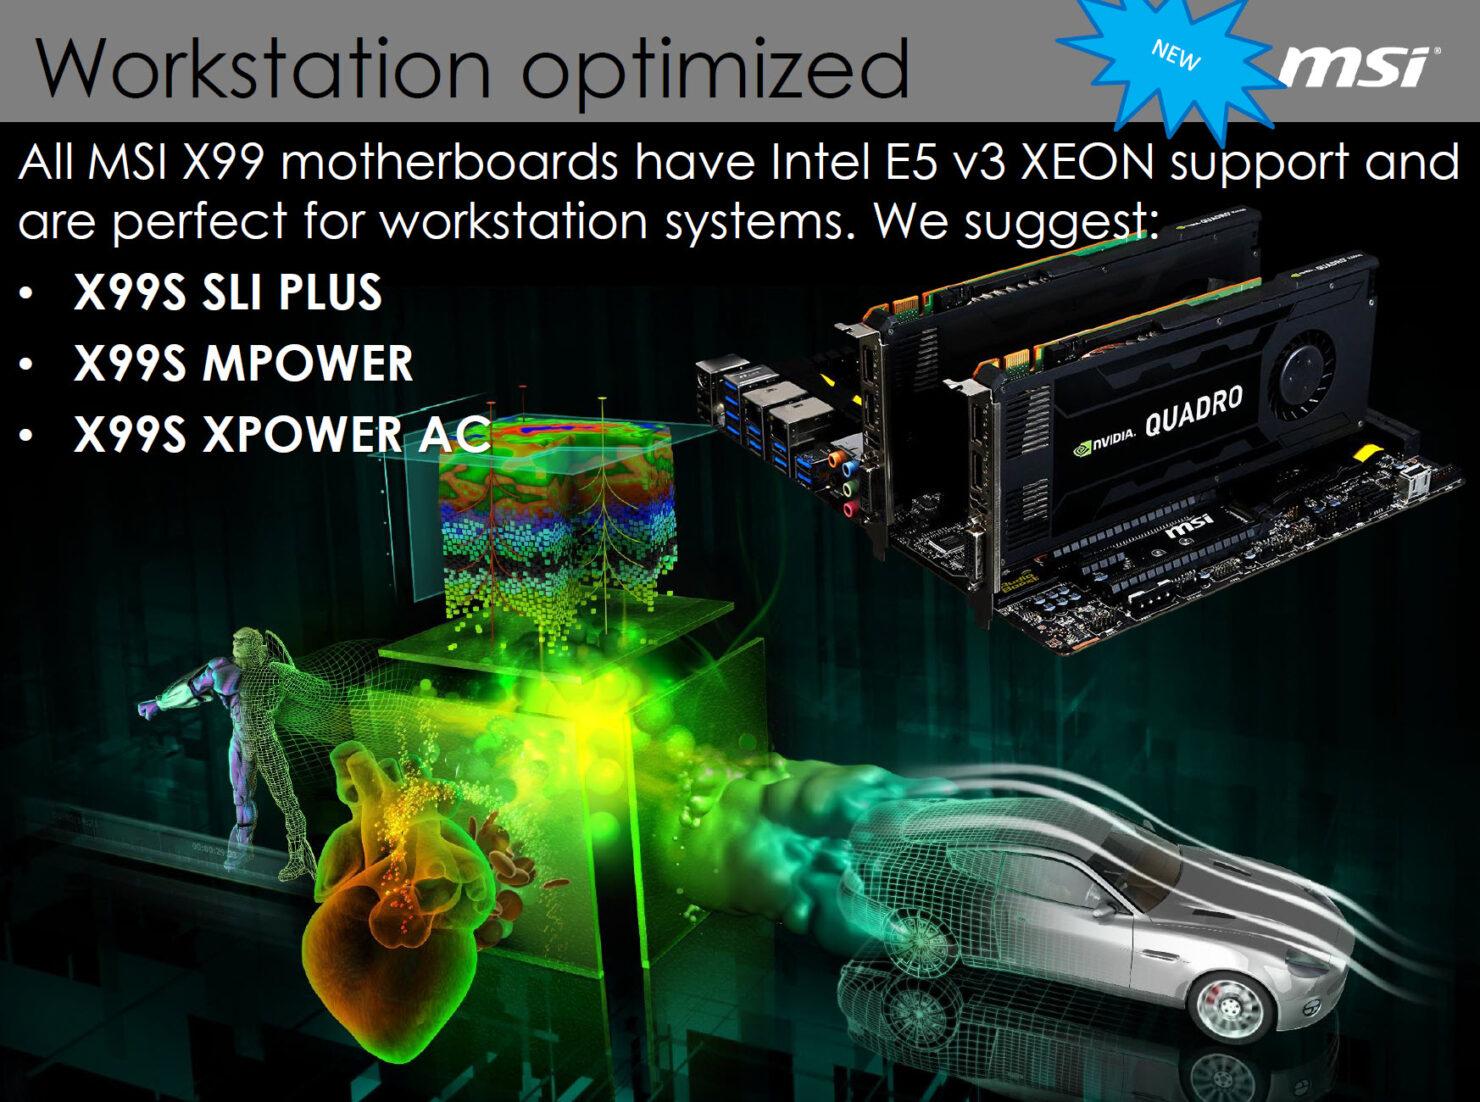 msi-x99-motherboard-press-slides_15